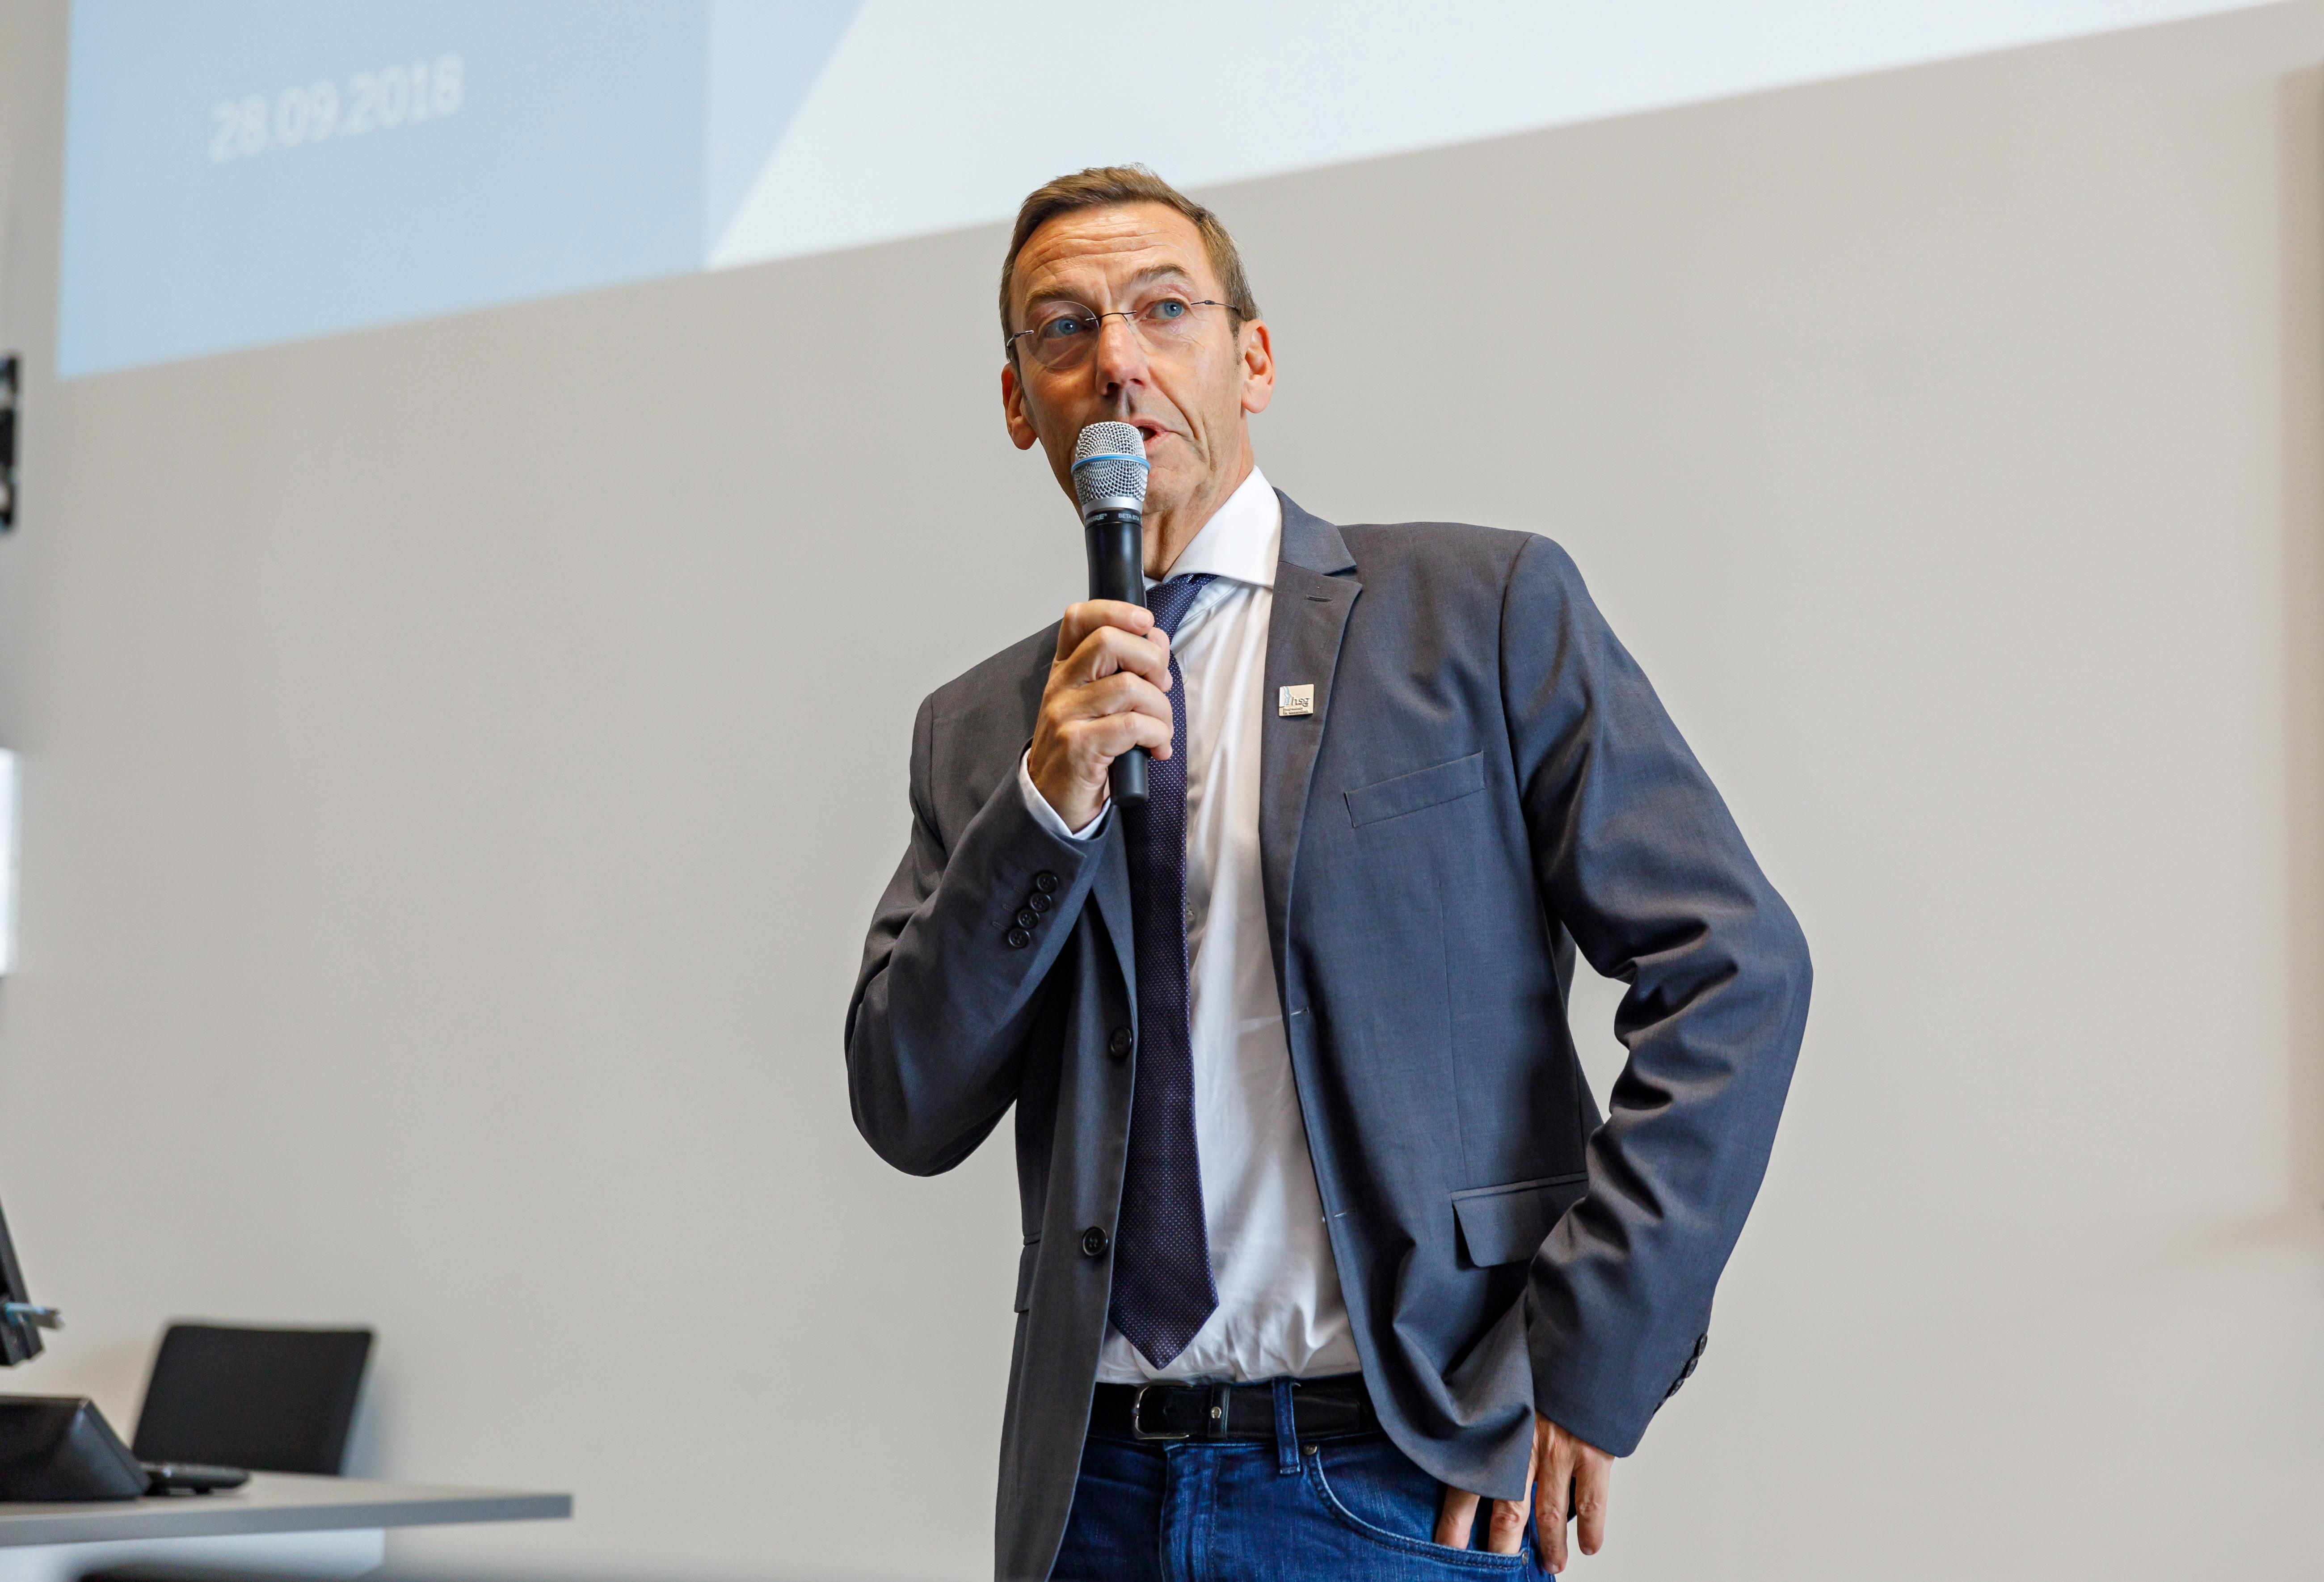 hsg-Kanzler Werner Brüning